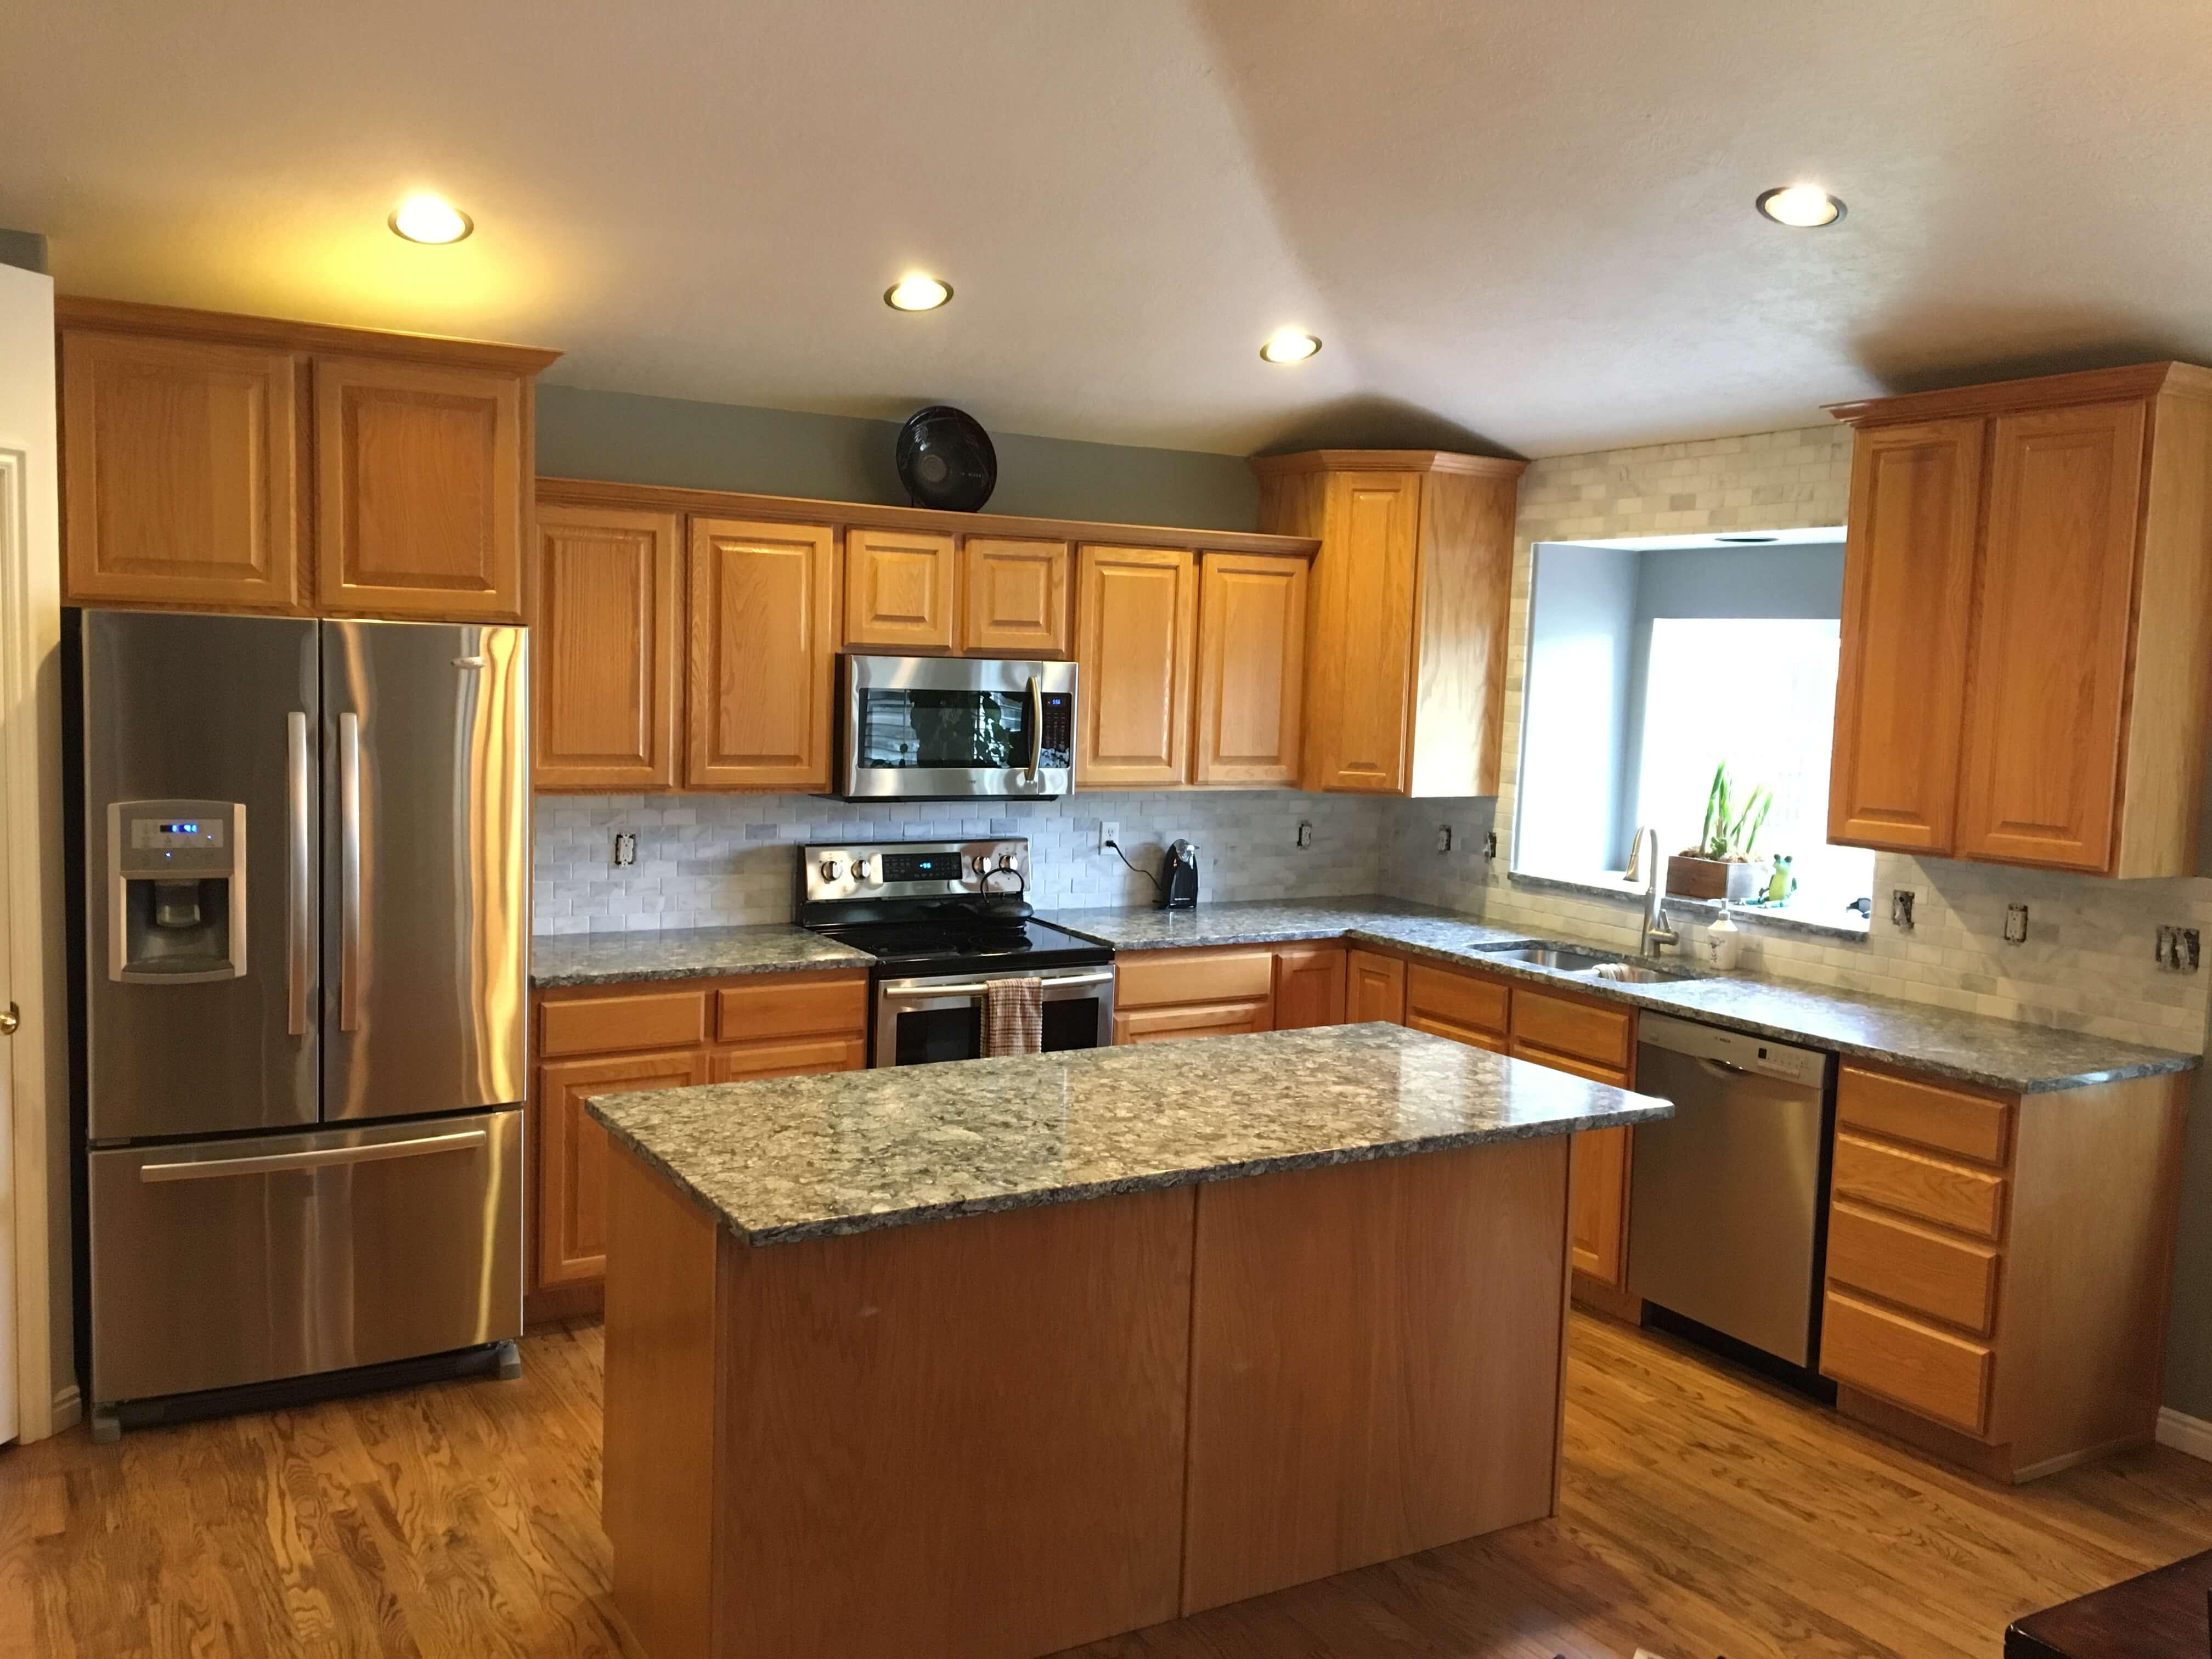 Miraculous Woodworks Refurbishing Cabinet Refinishing Salt Lake City Ut Interior Design Ideas Lukepblogthenellocom